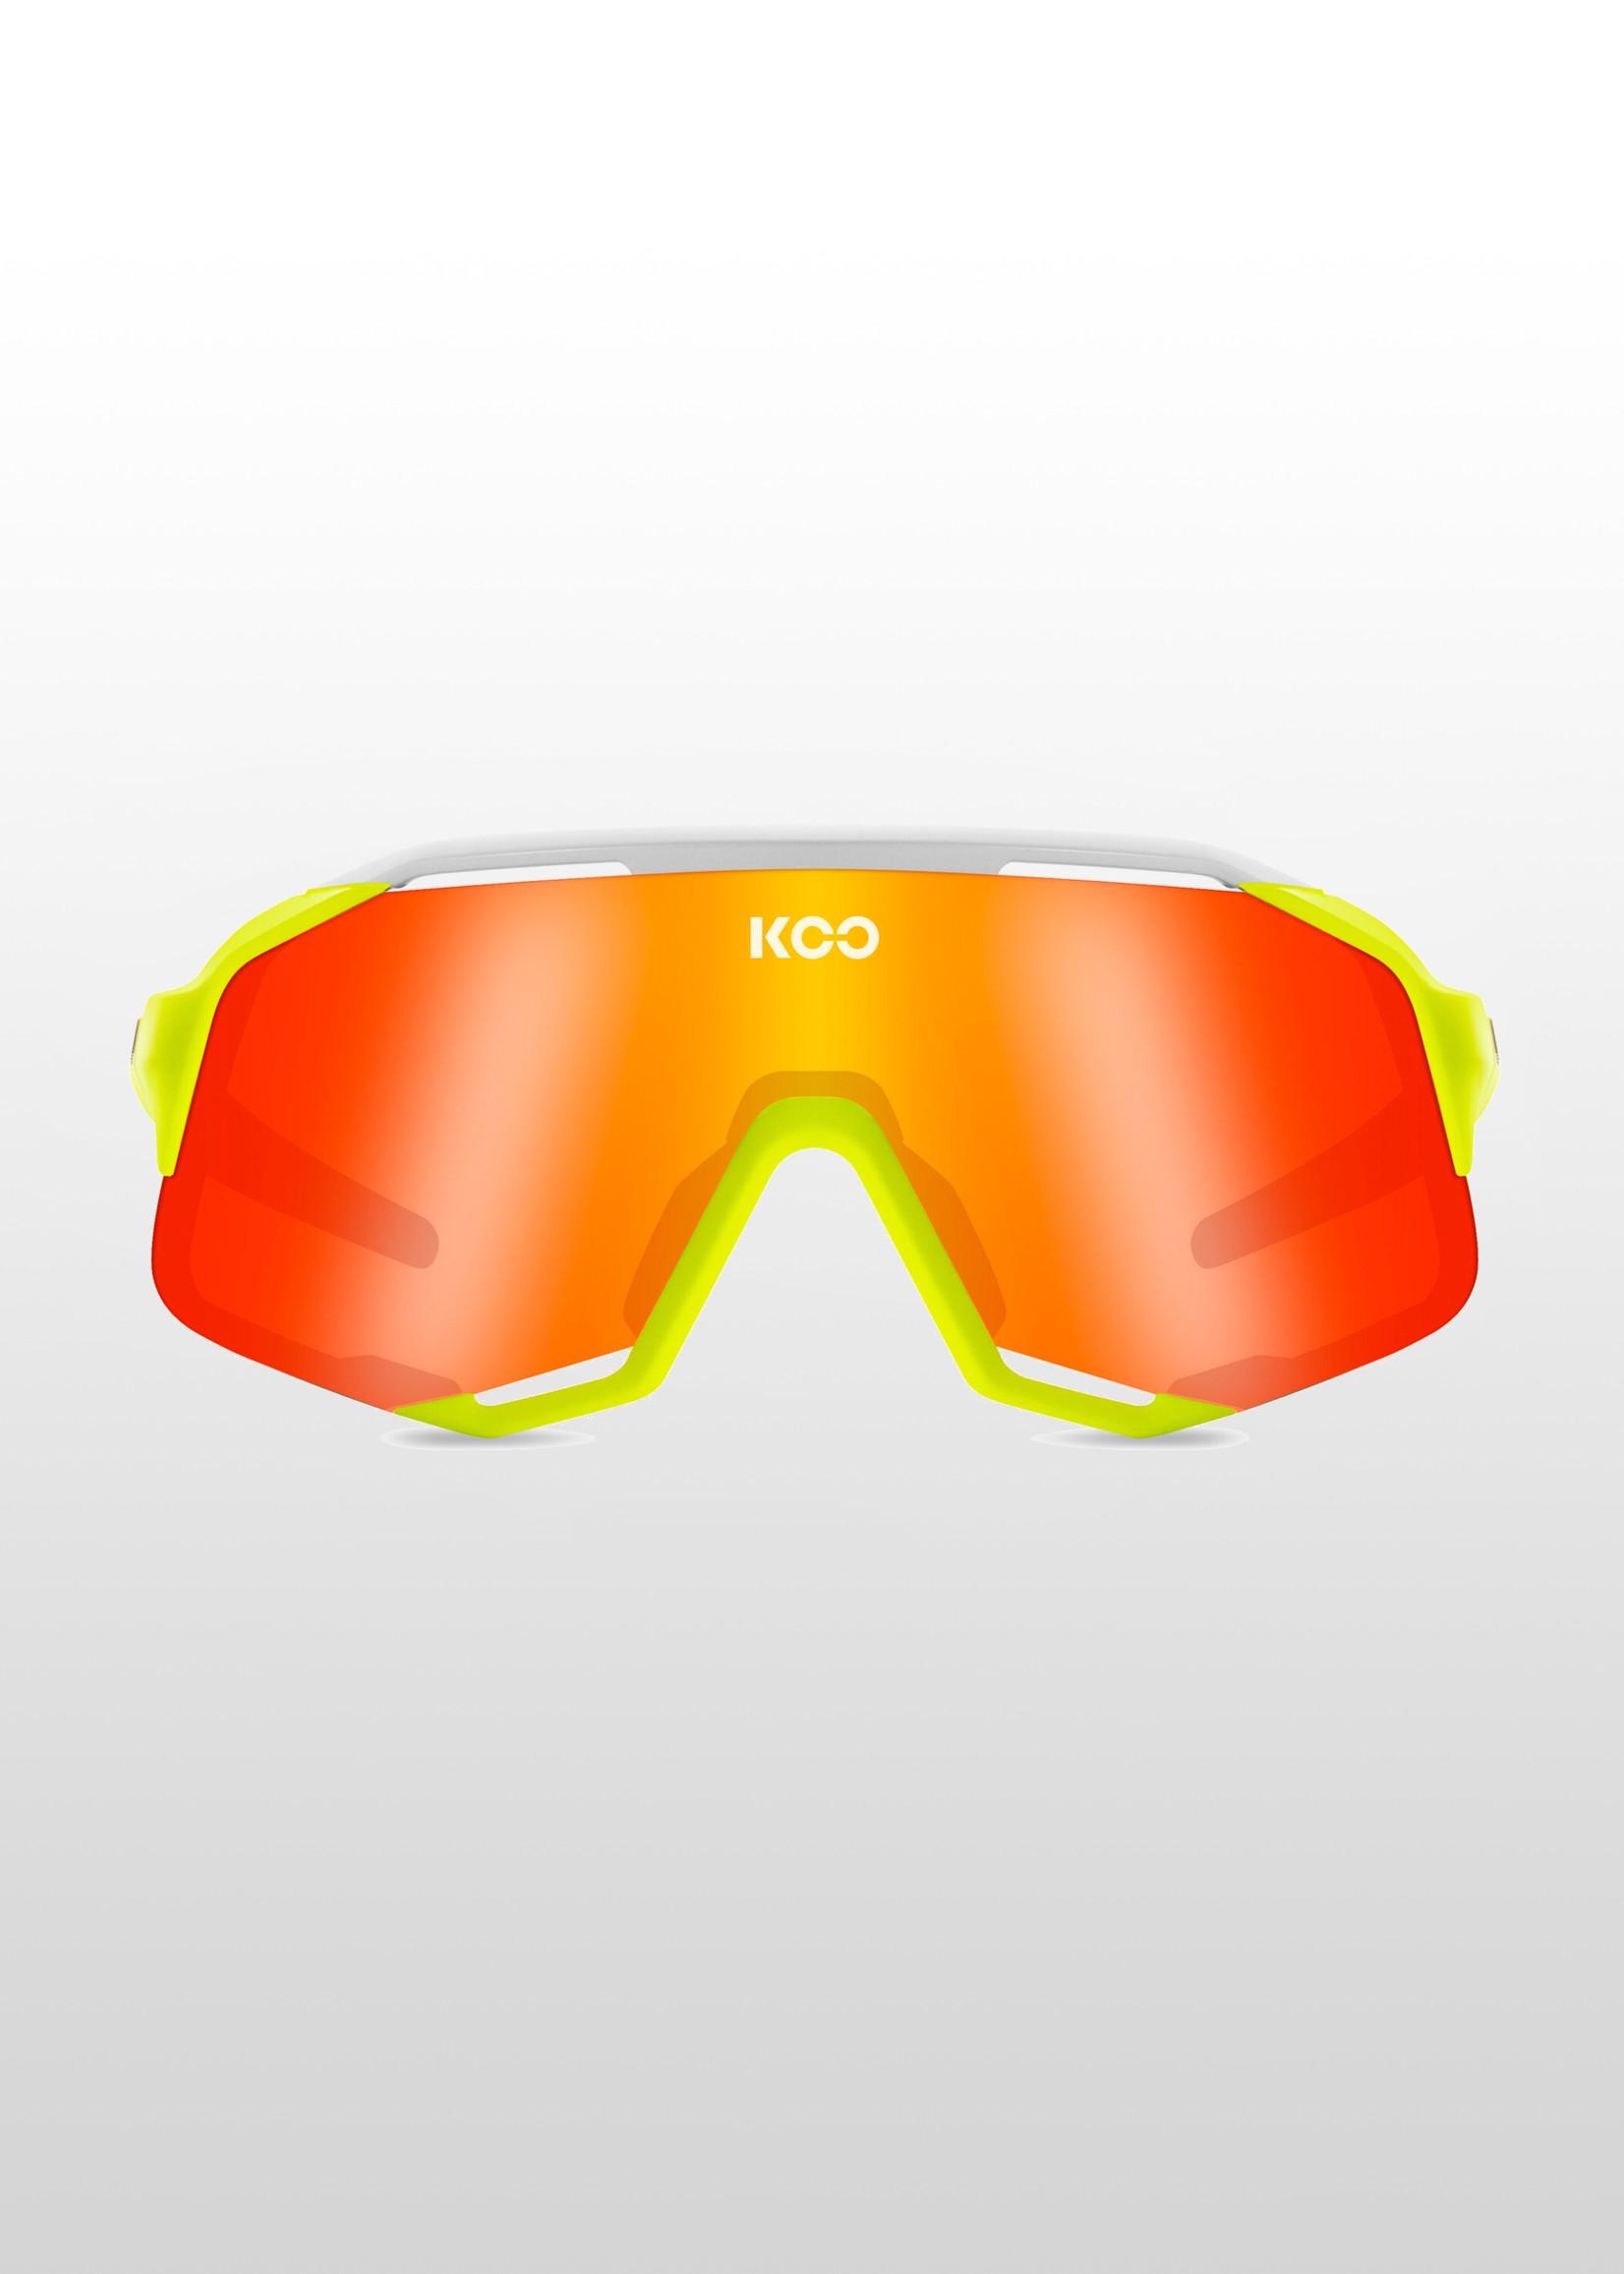 KOO Demos Sunglasses - Ltd Edition